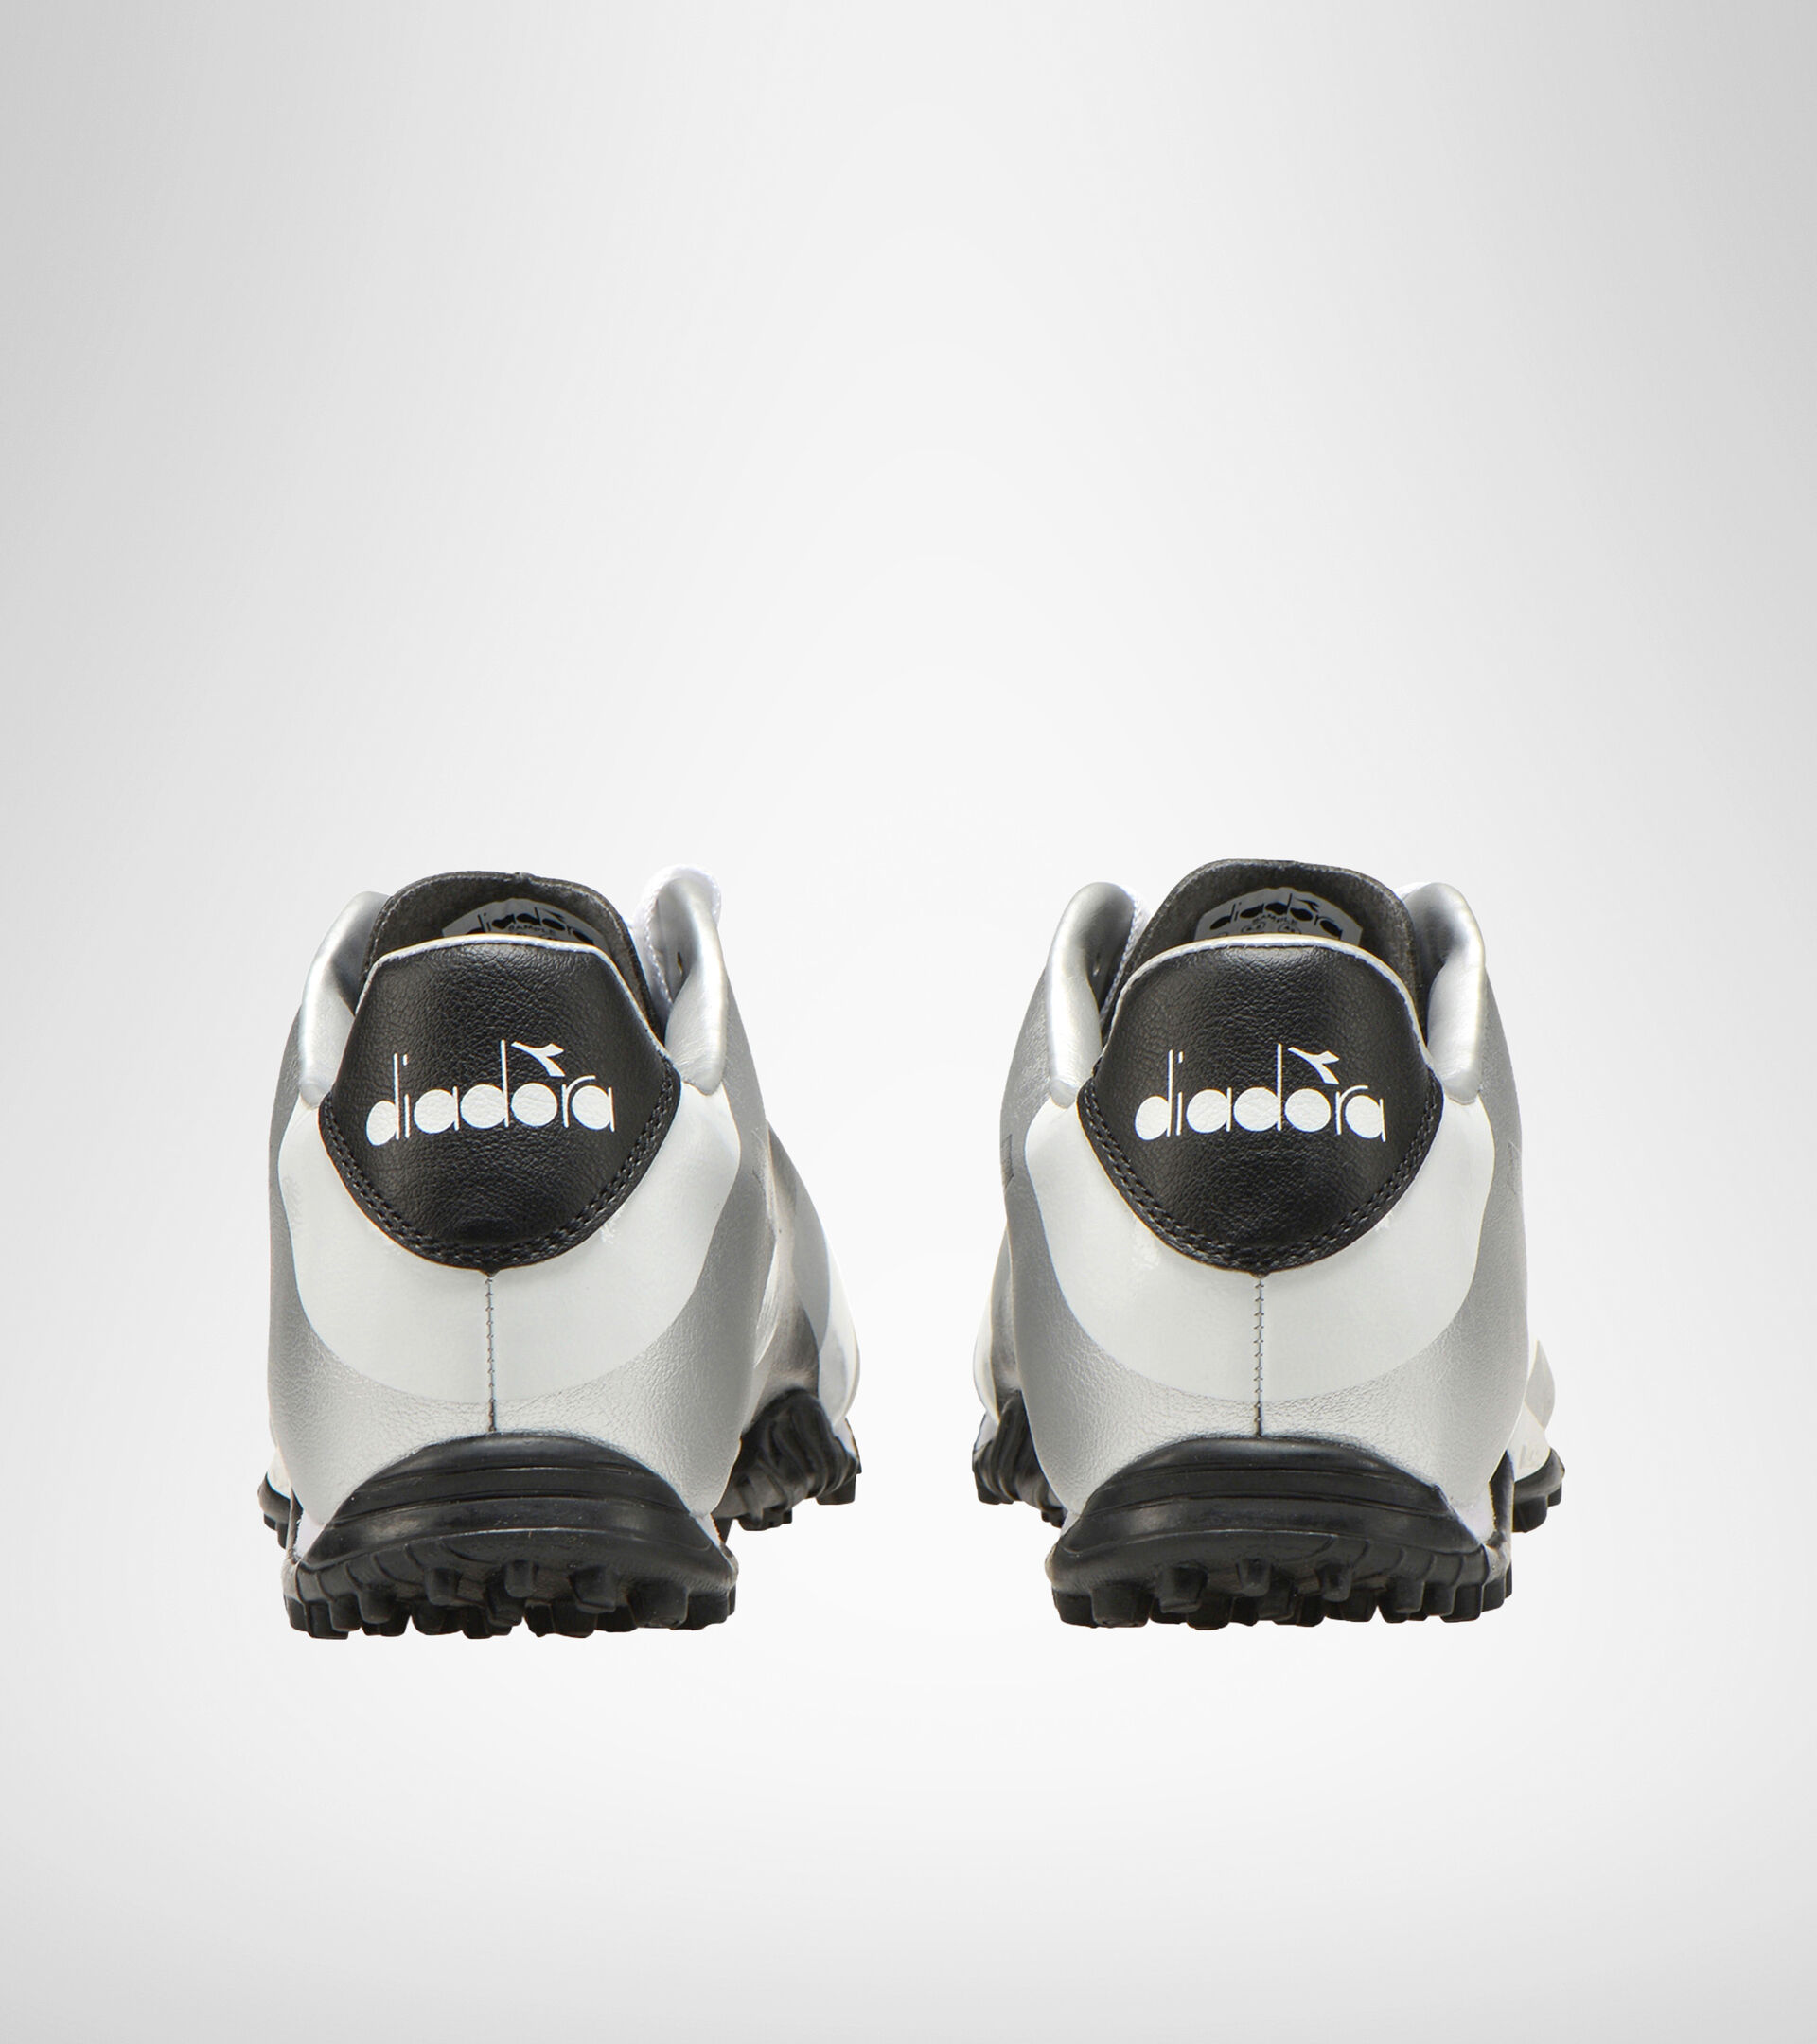 Hard ground and artificial turf football boot RAPTOR R TF WHITE/BLACK/SILVER DD - Diadora